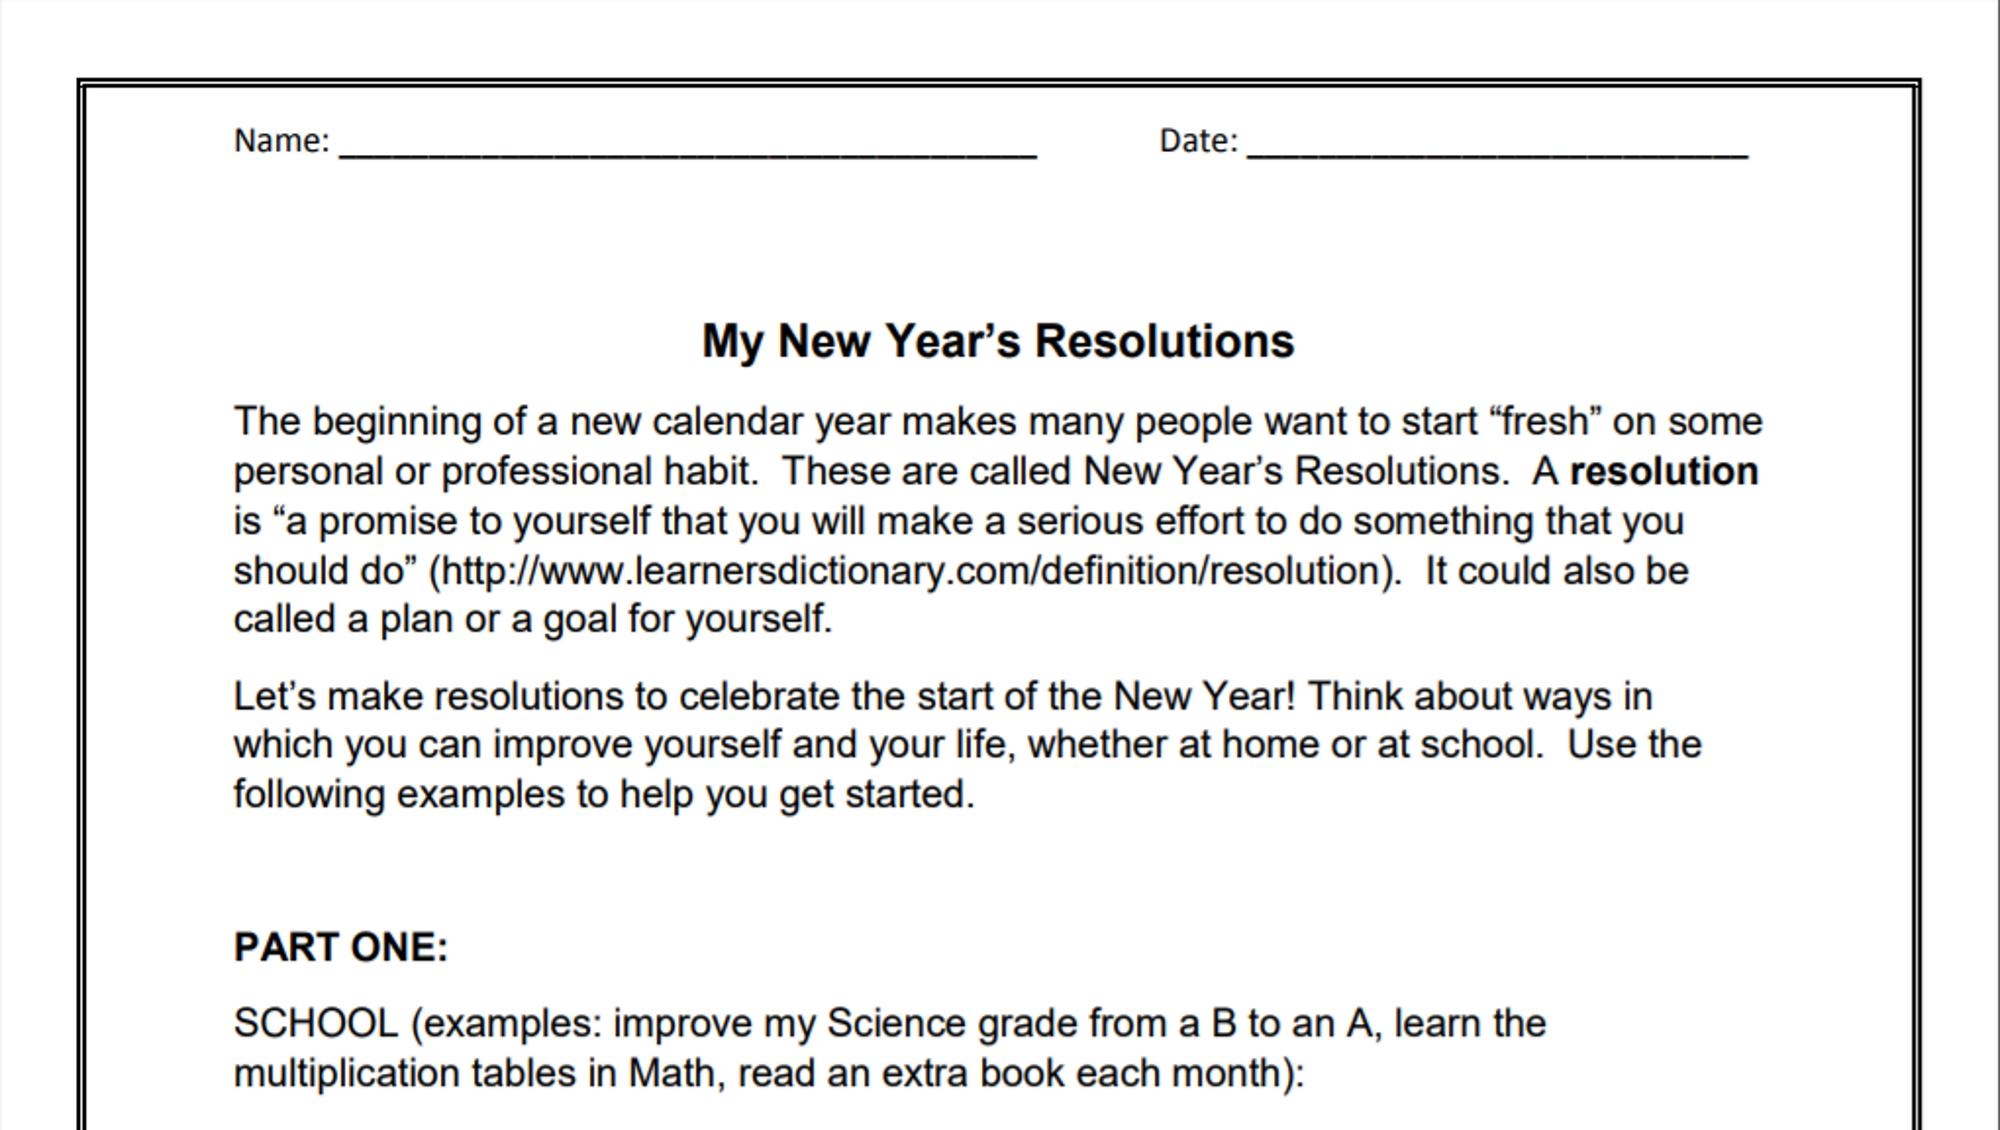 010 My New Year Resolution Essay Singular High School Student 2019 For Class 5 Full